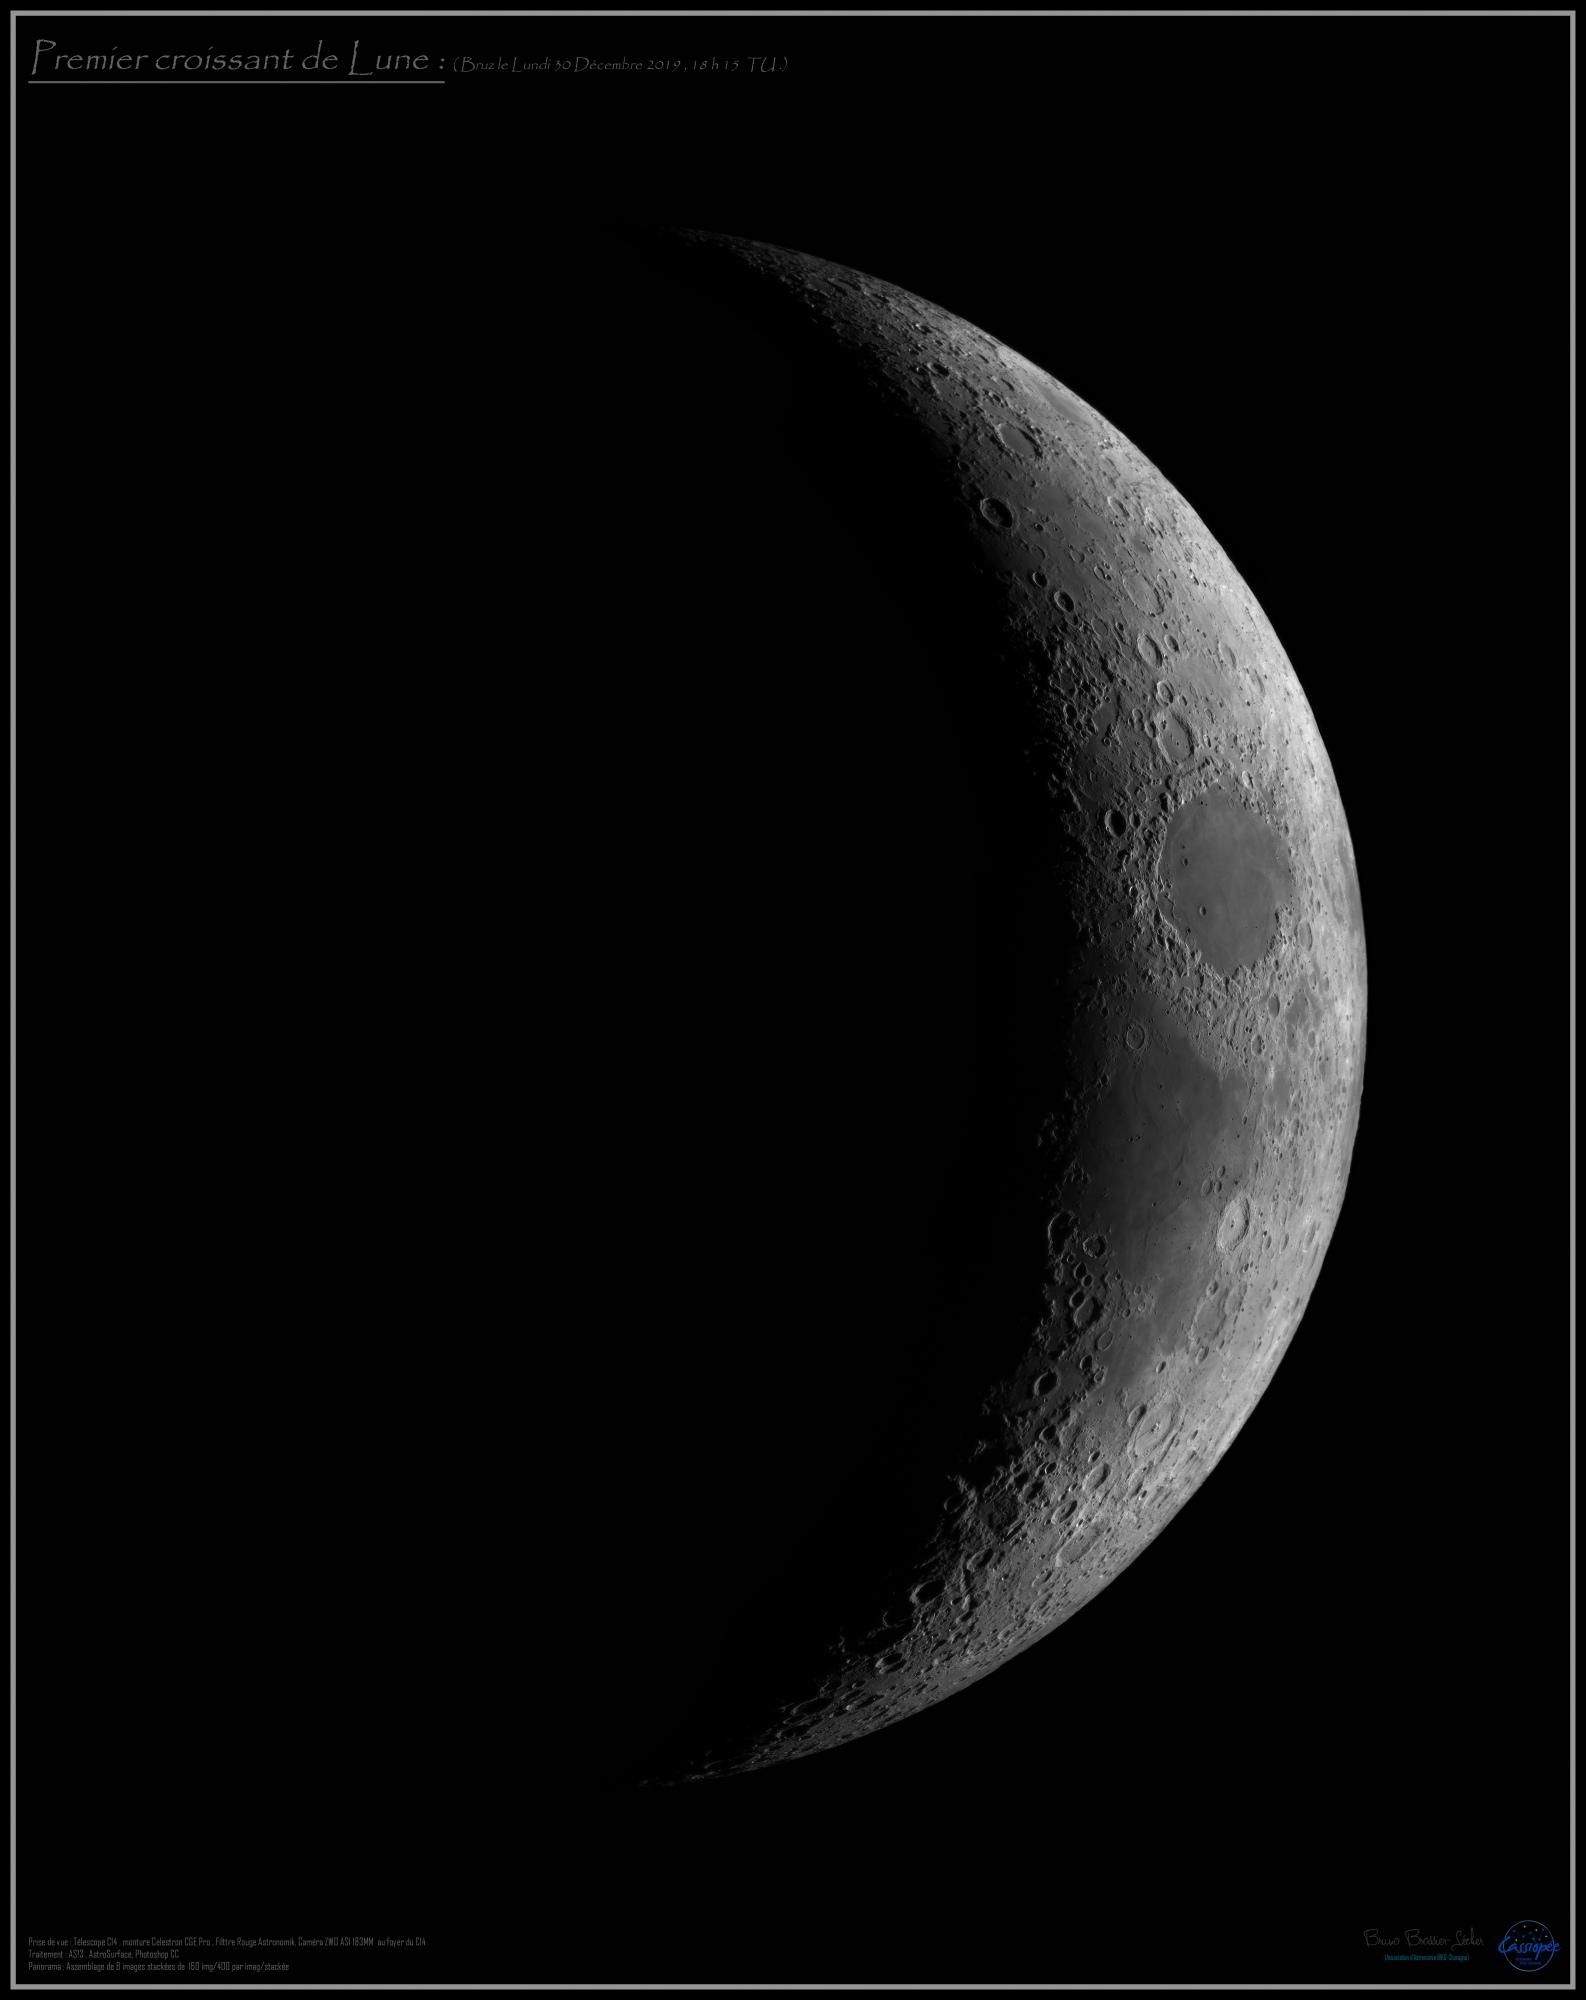 2019-12-30_T_18-39-49-0527_Rouge_lune_WEB.png.thumb.jpg.1964787789b8c83212ca40800d90ec51.jpg